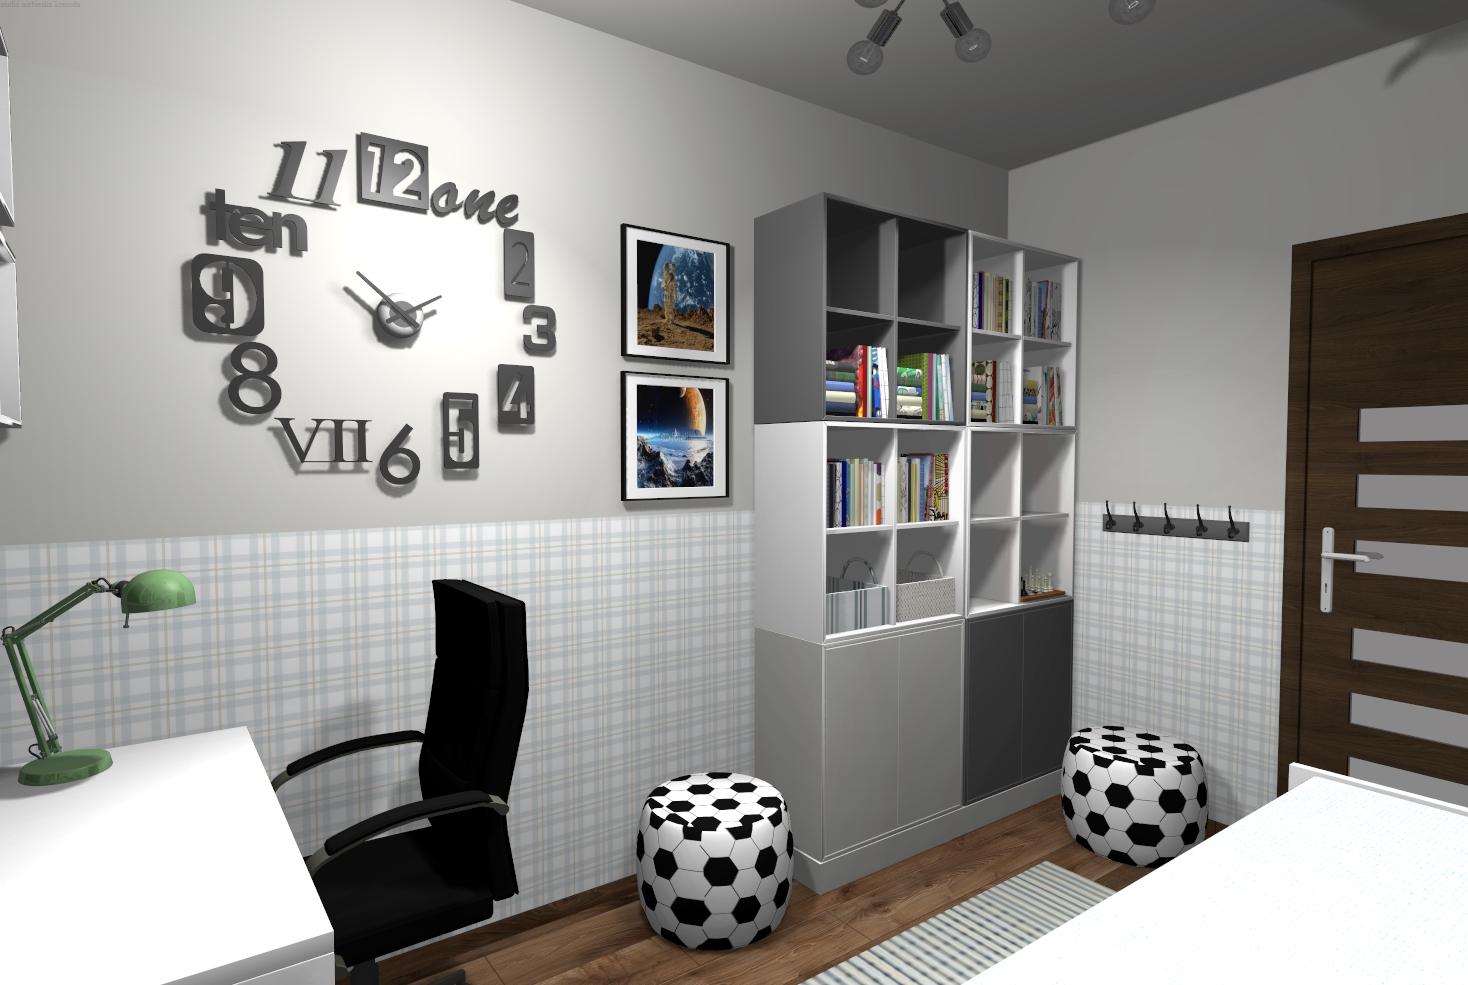 Pokój chłopca  projekt online